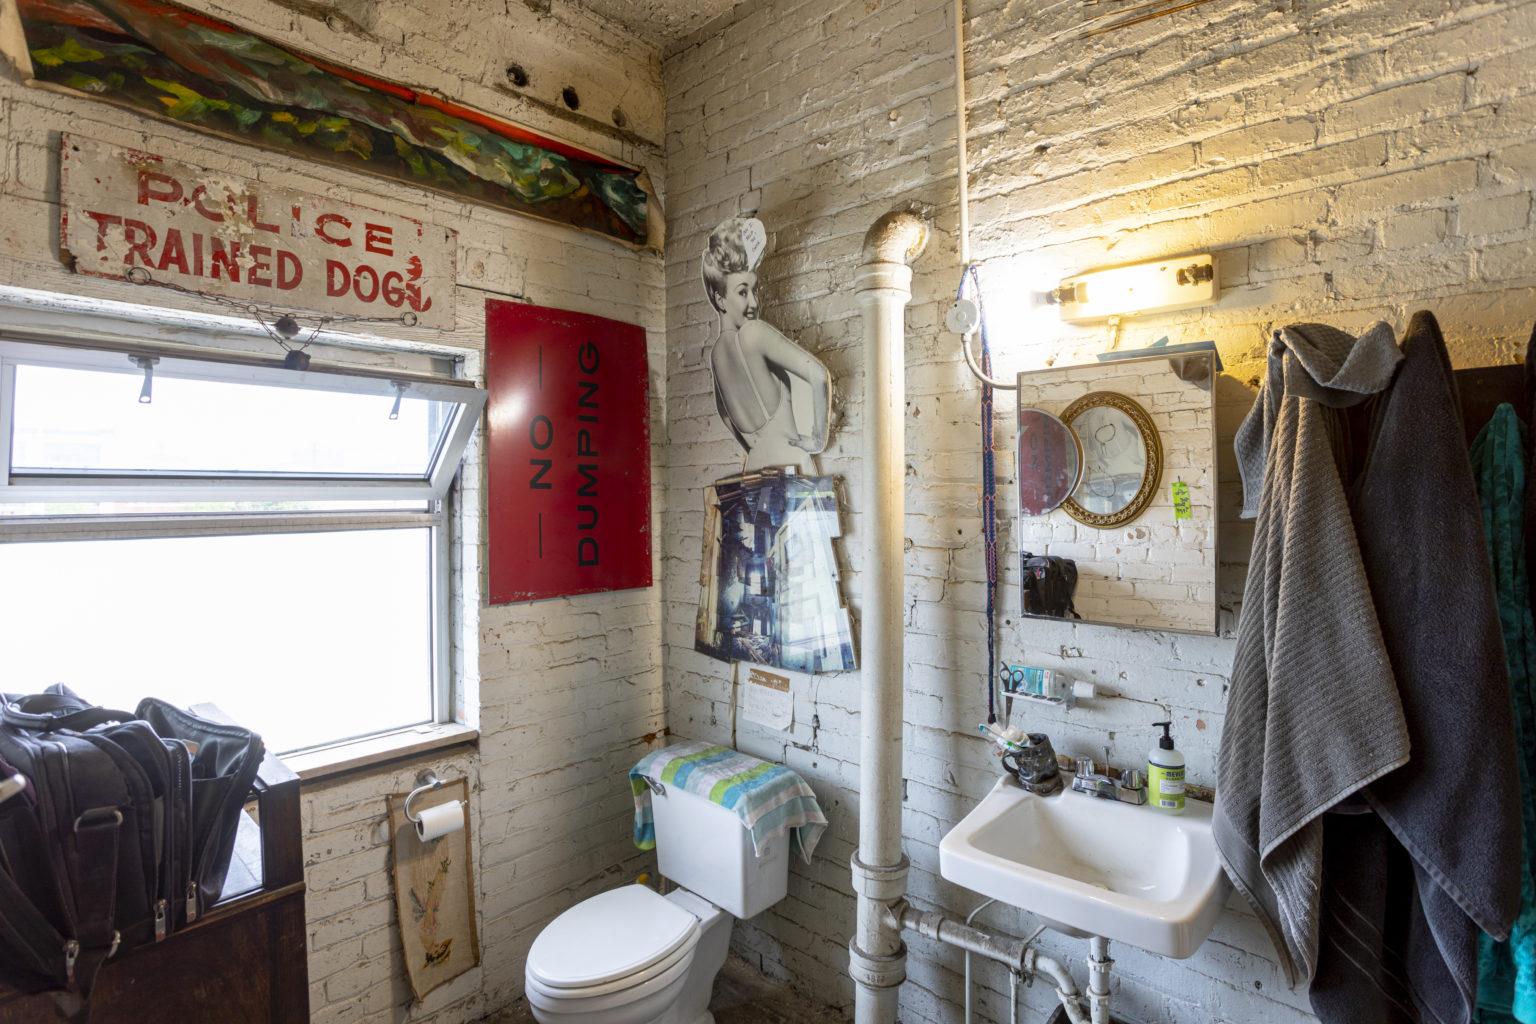 Week 11: <em>Bathroom</em>,  Scott Hocking, June 21, 2020